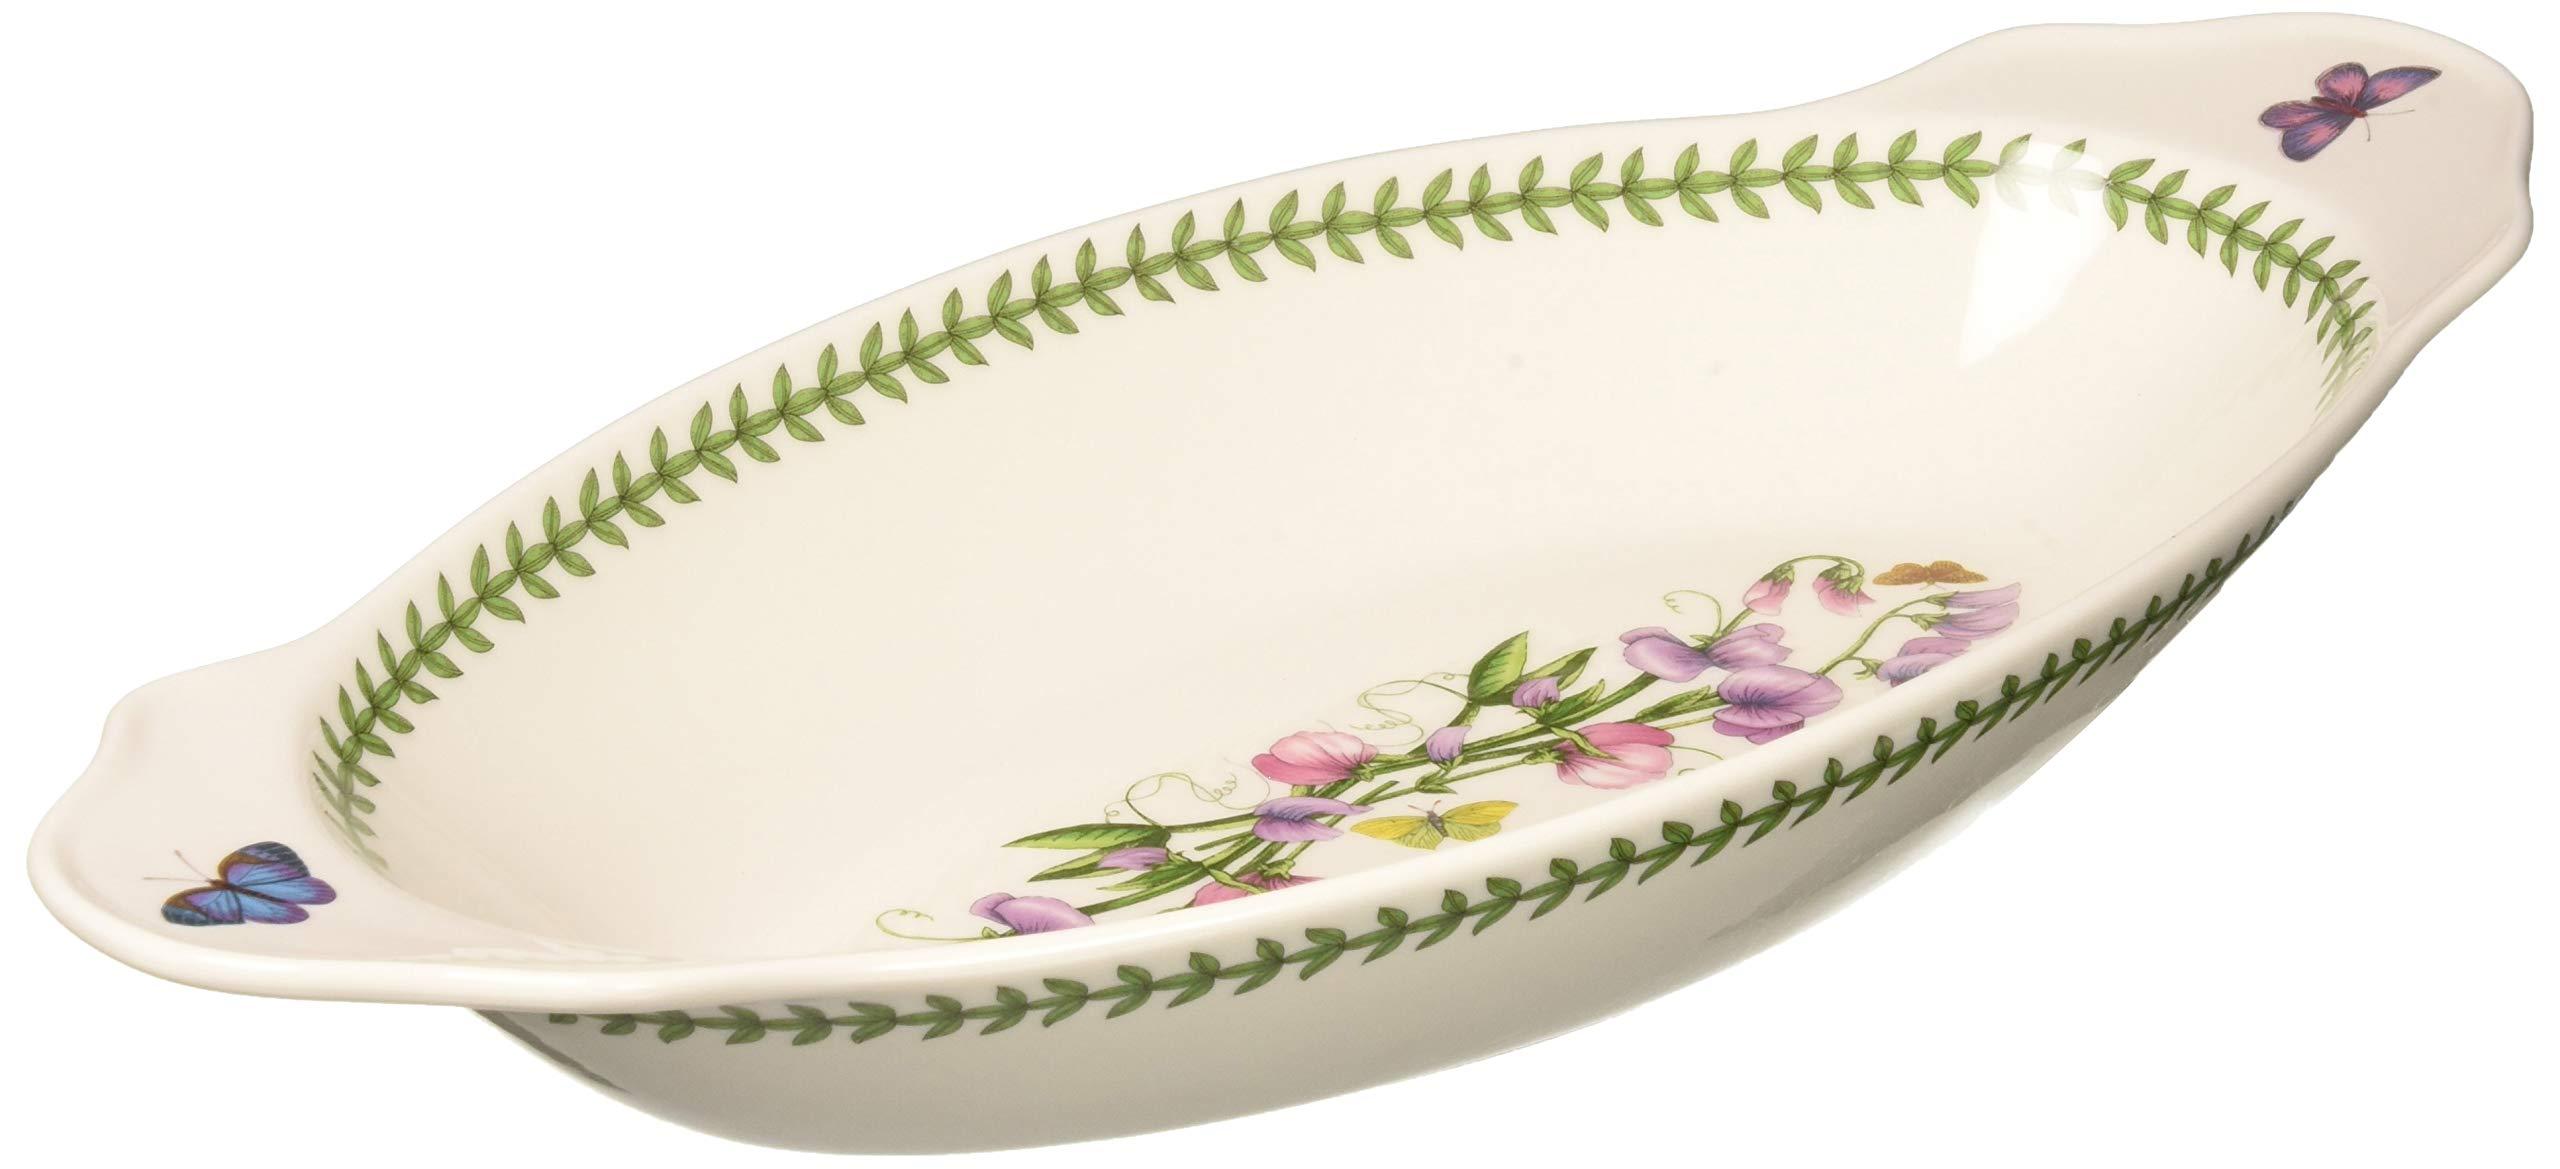 Portmeirion 612723 Botanic Garden Oval Baking Dish with Handles, White